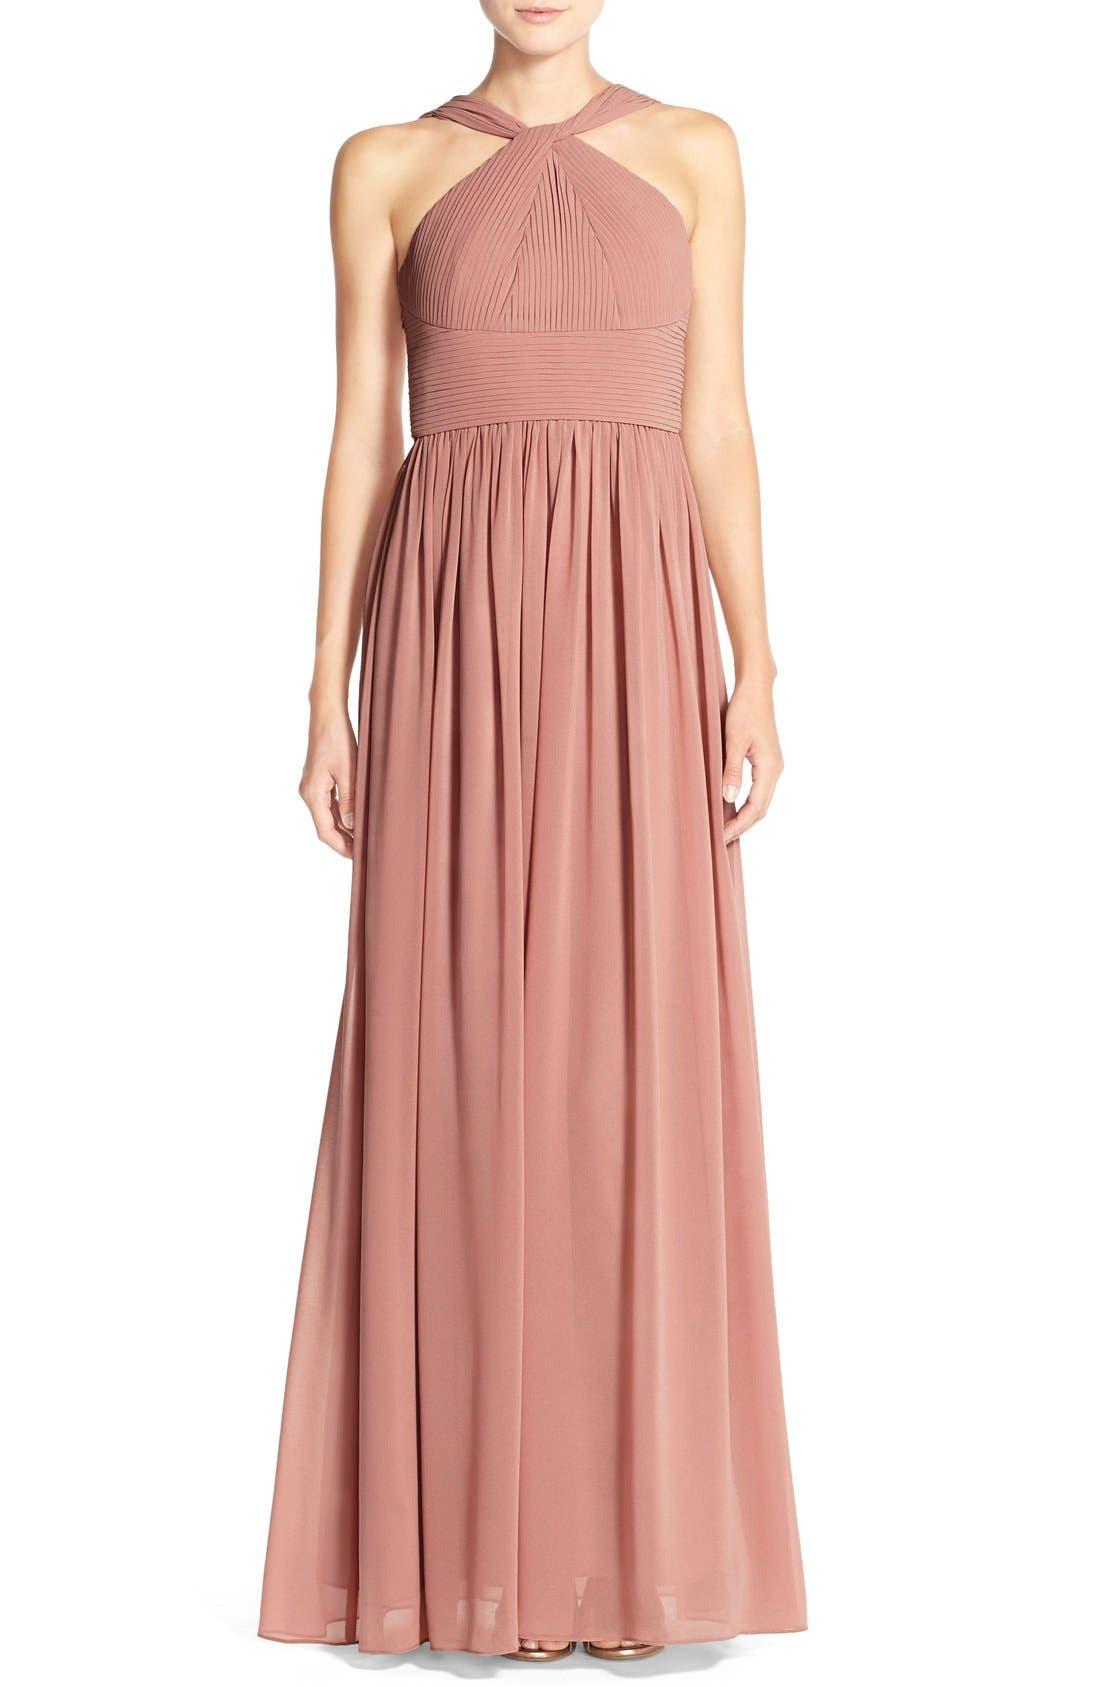 Main Image - DonnaMorgan 'Hayley' Halter Style Pleat Chiffon Gown